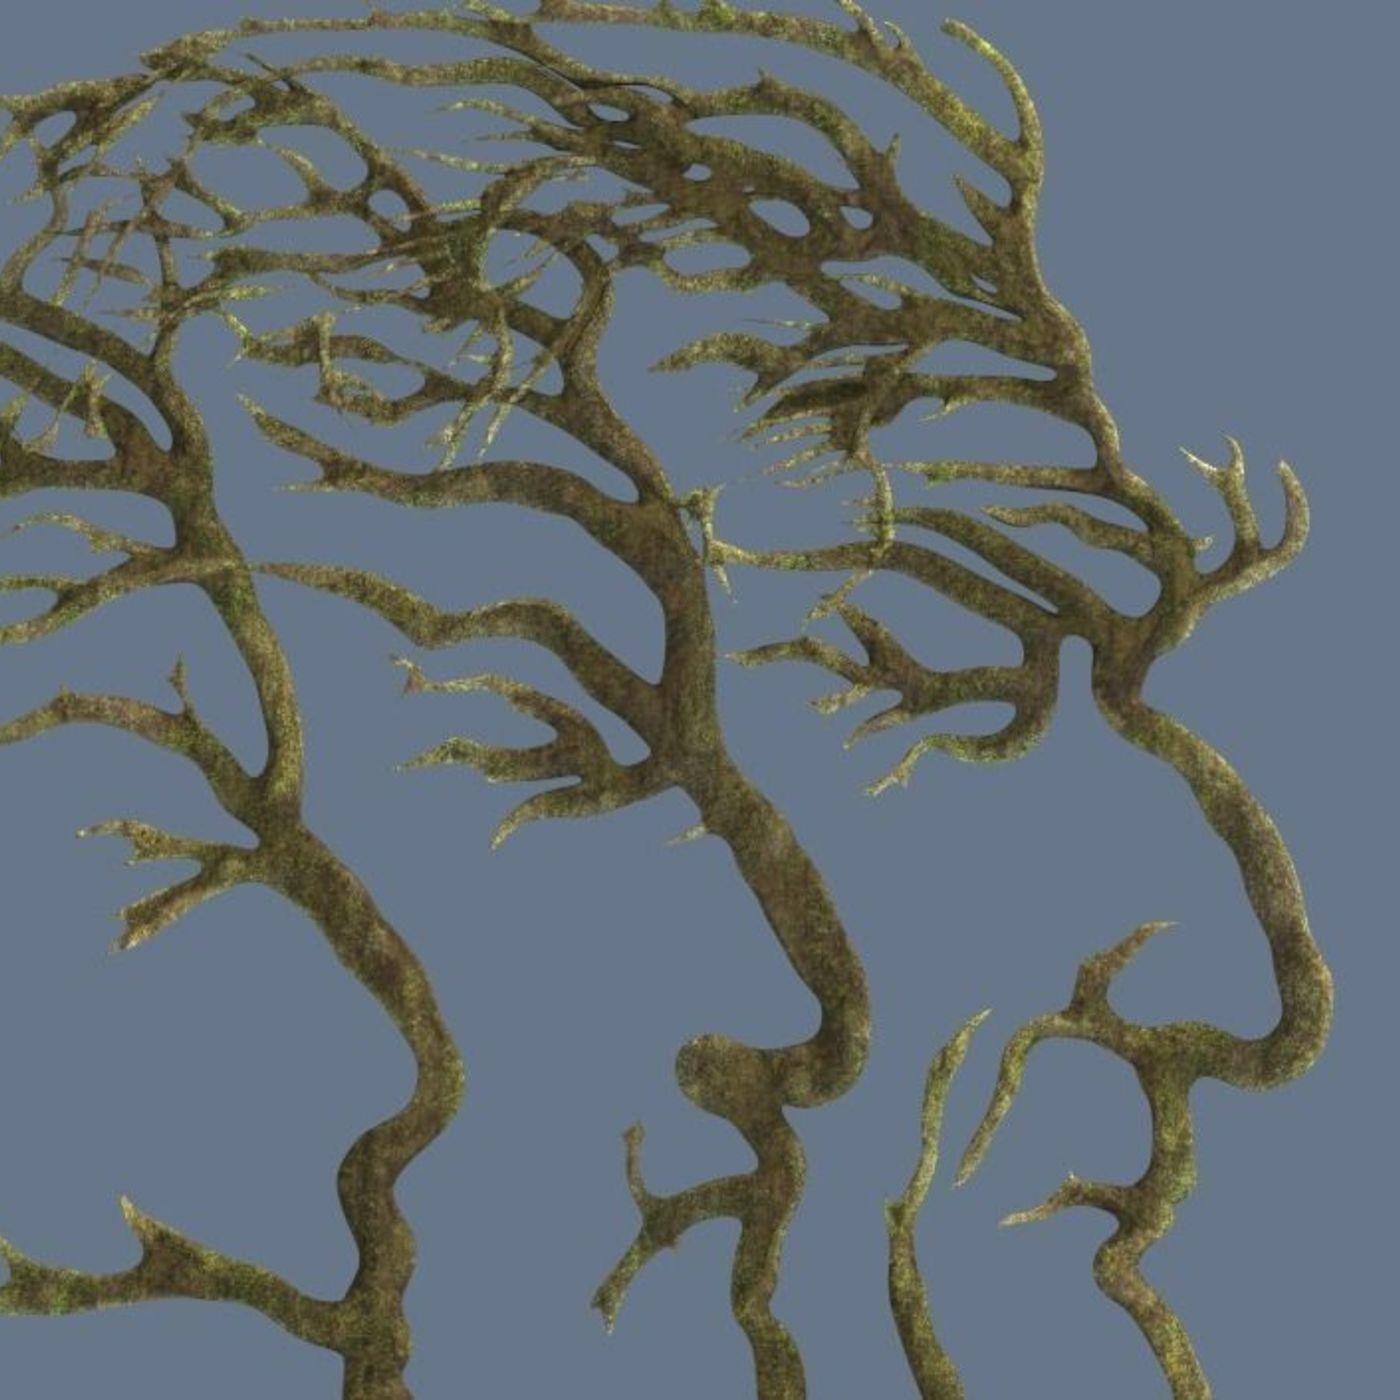 People silhouette trees